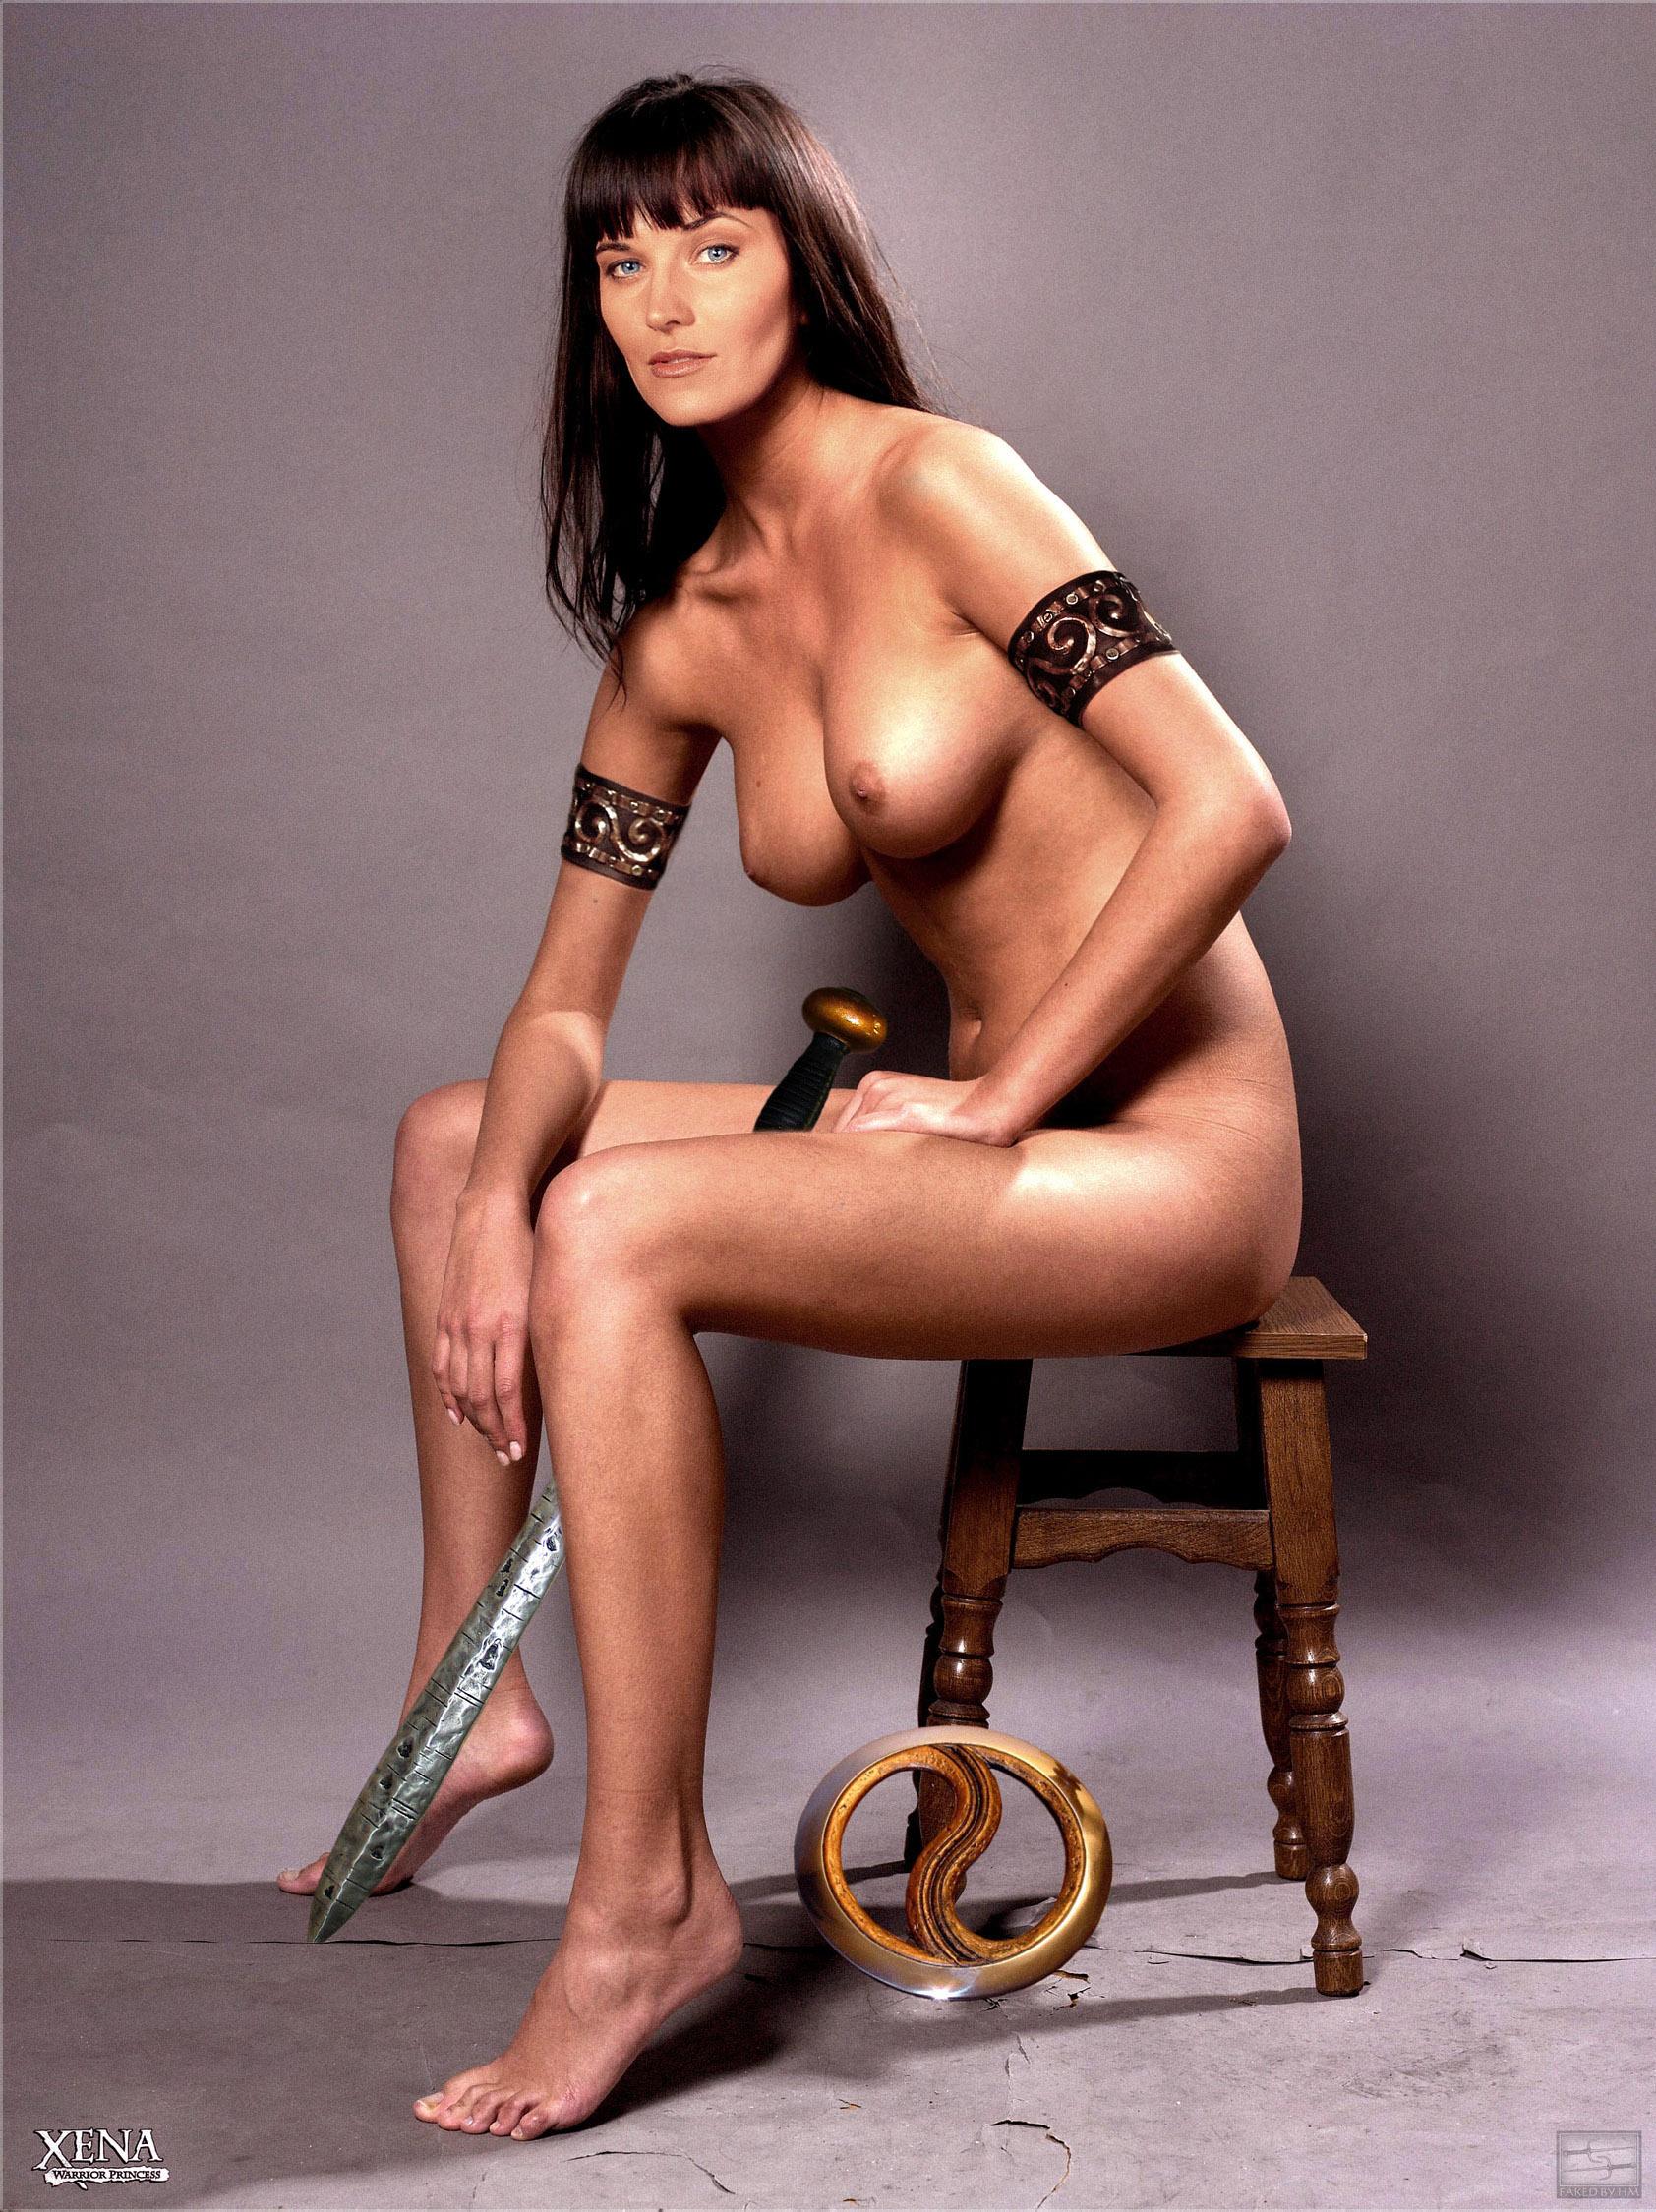 Xena warrior princess bondage